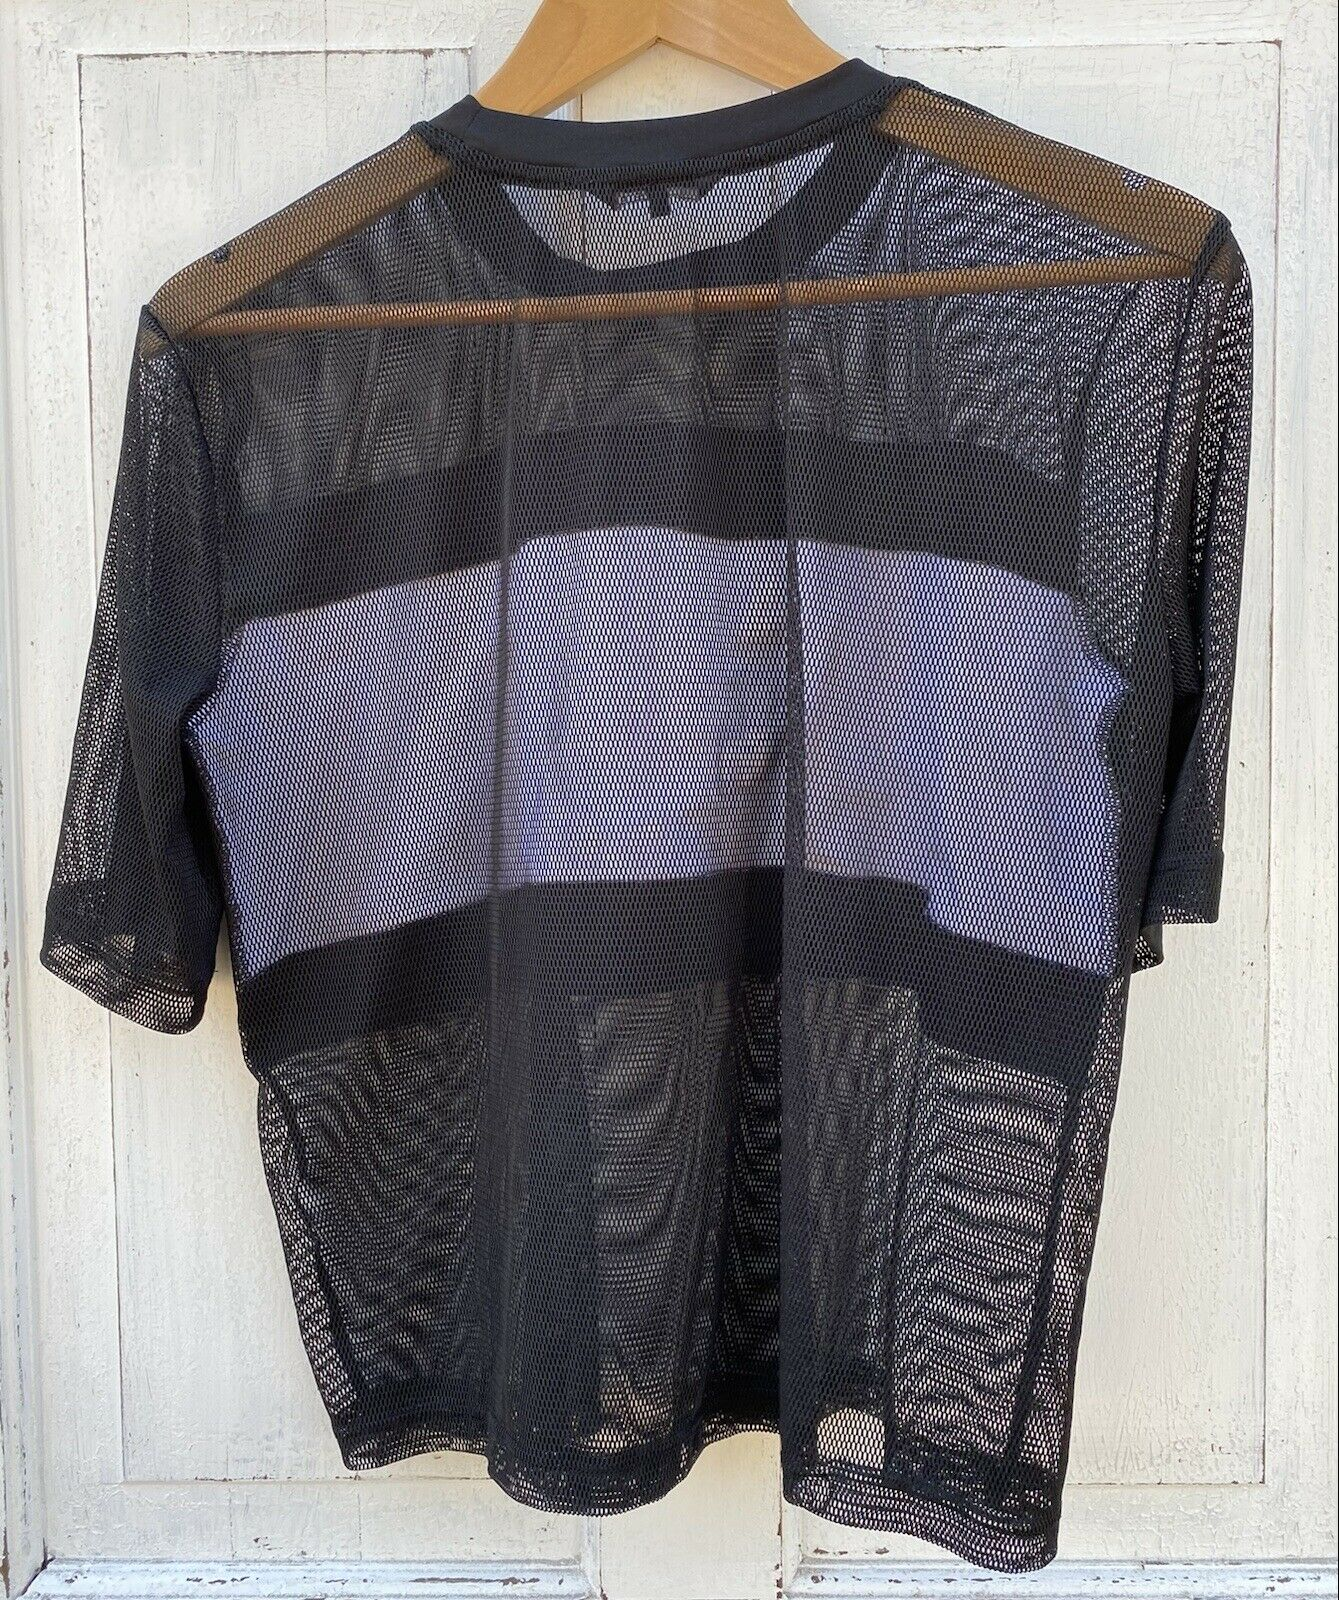 Bebe Sport Black Mesh Shirt Althetic Wear Women's… - image 3